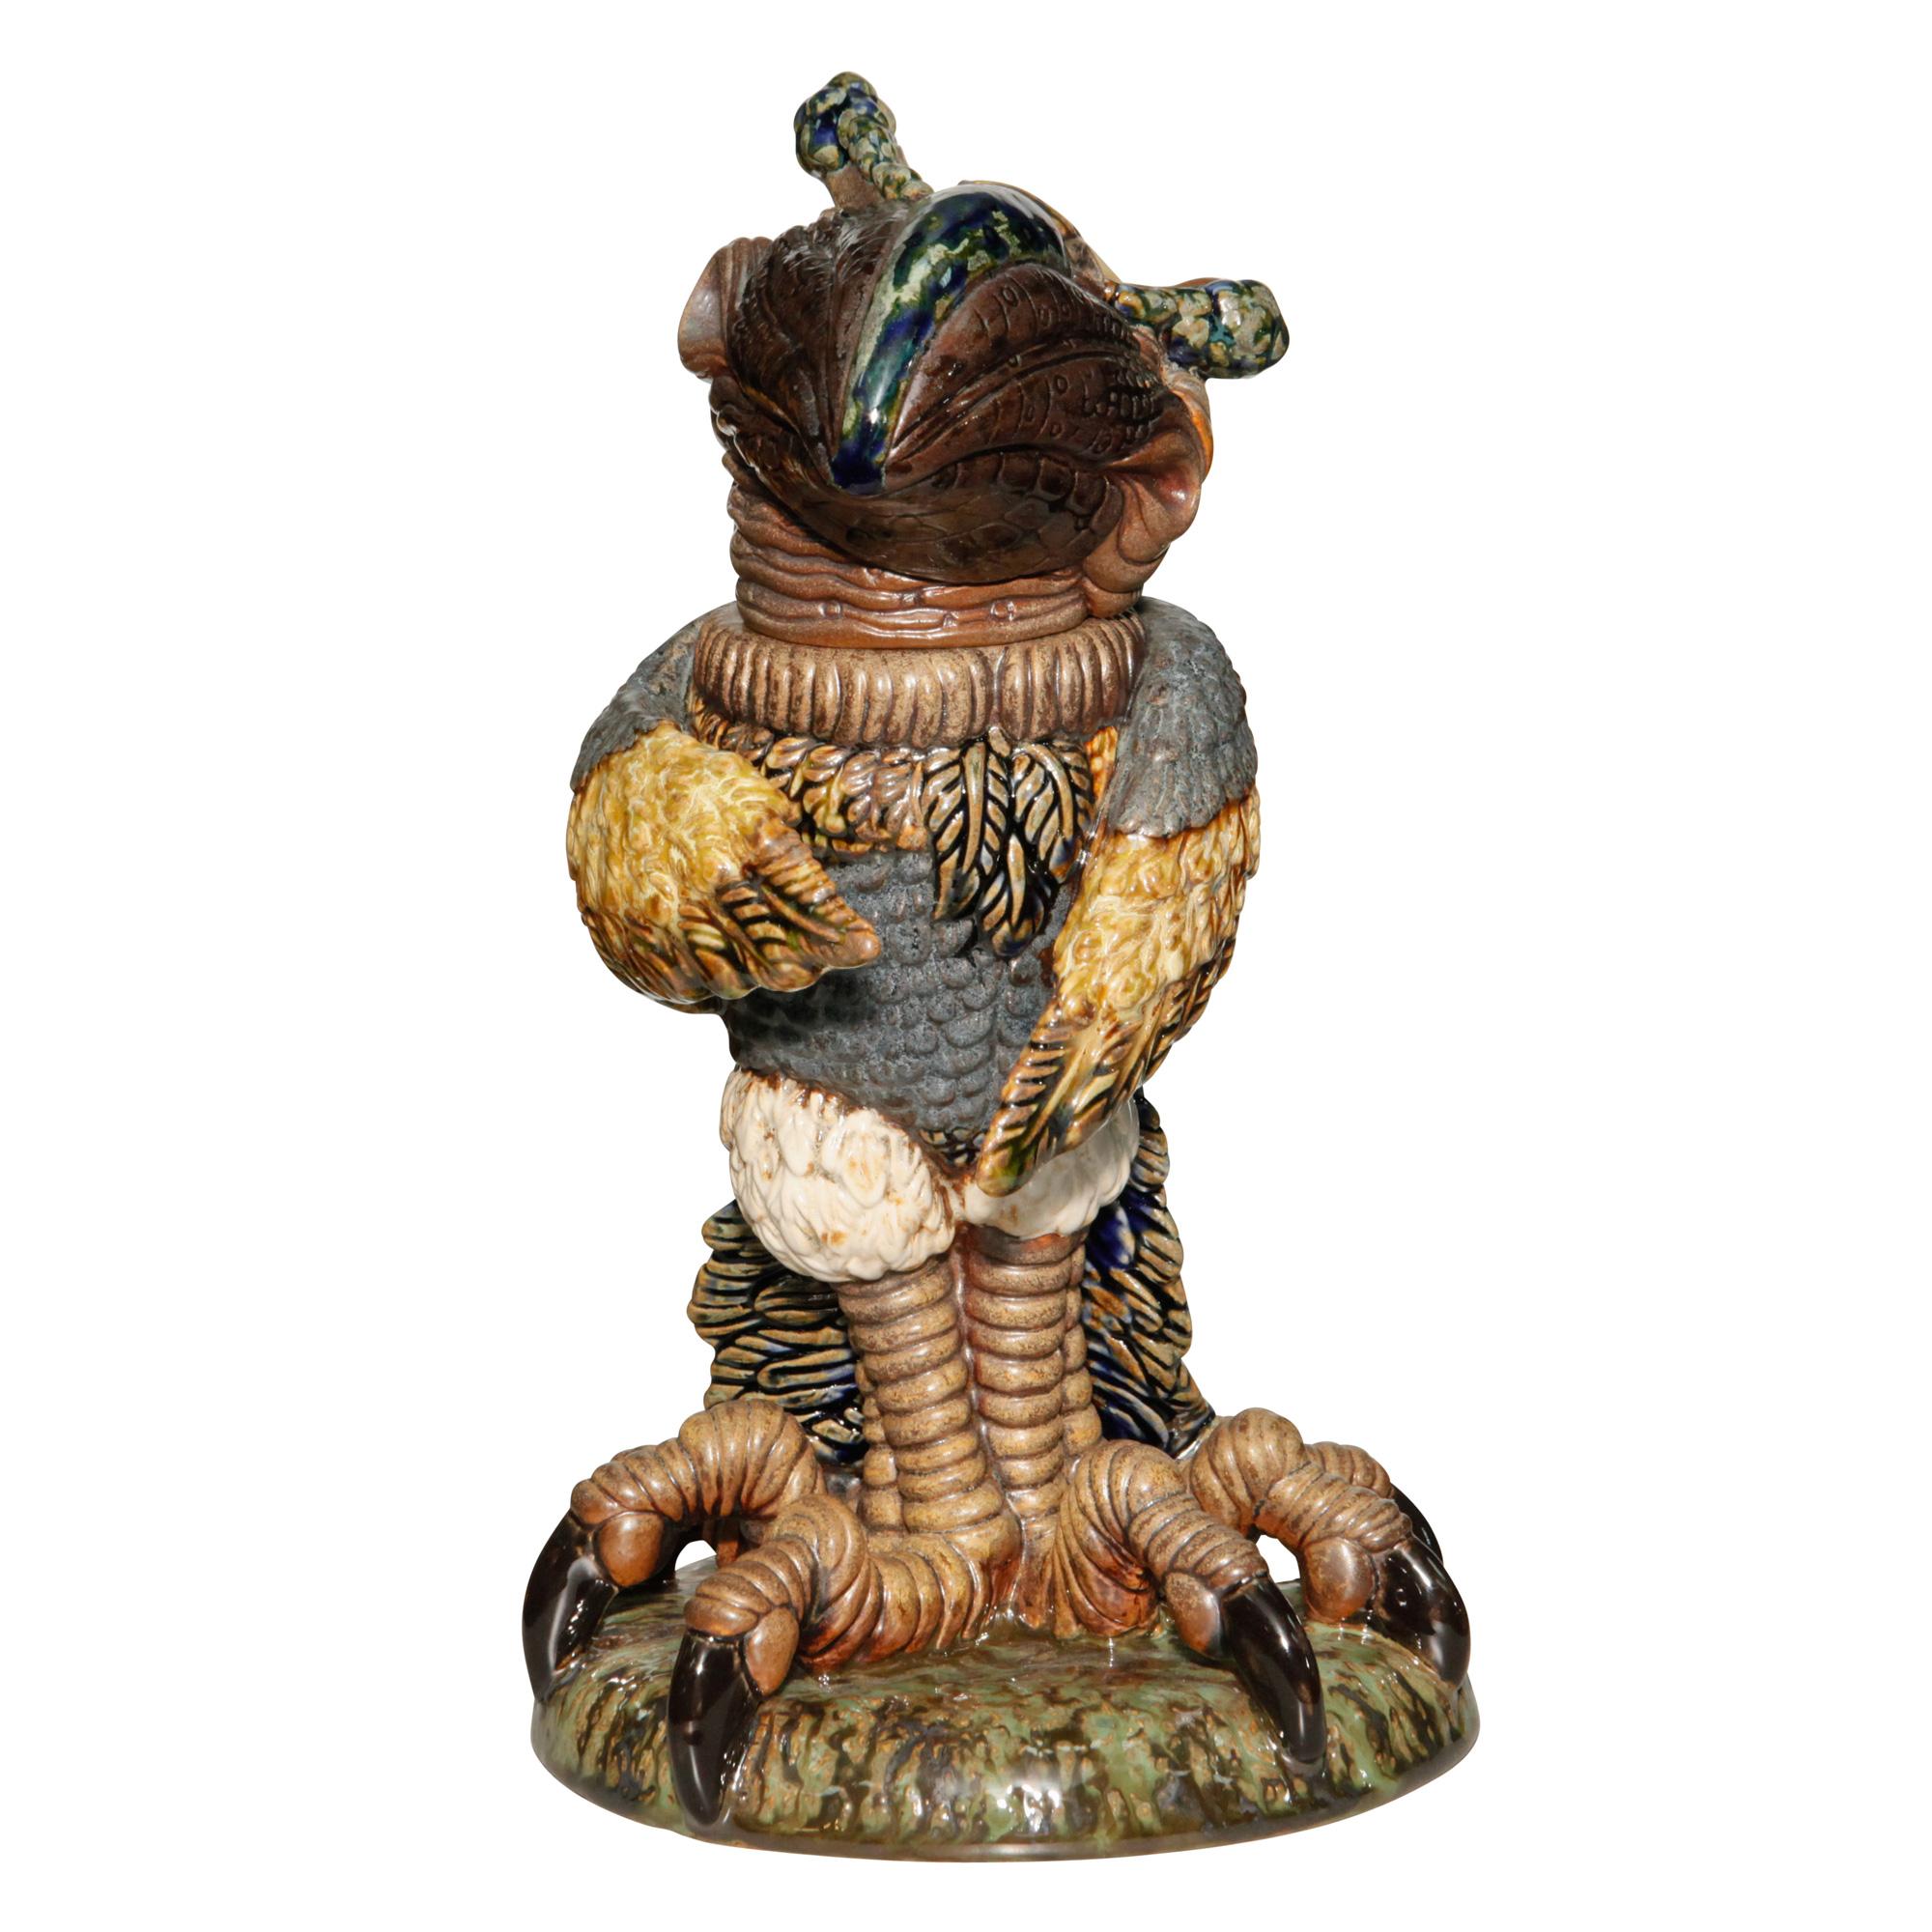 Norman Bird - Andrew Hull Pottery